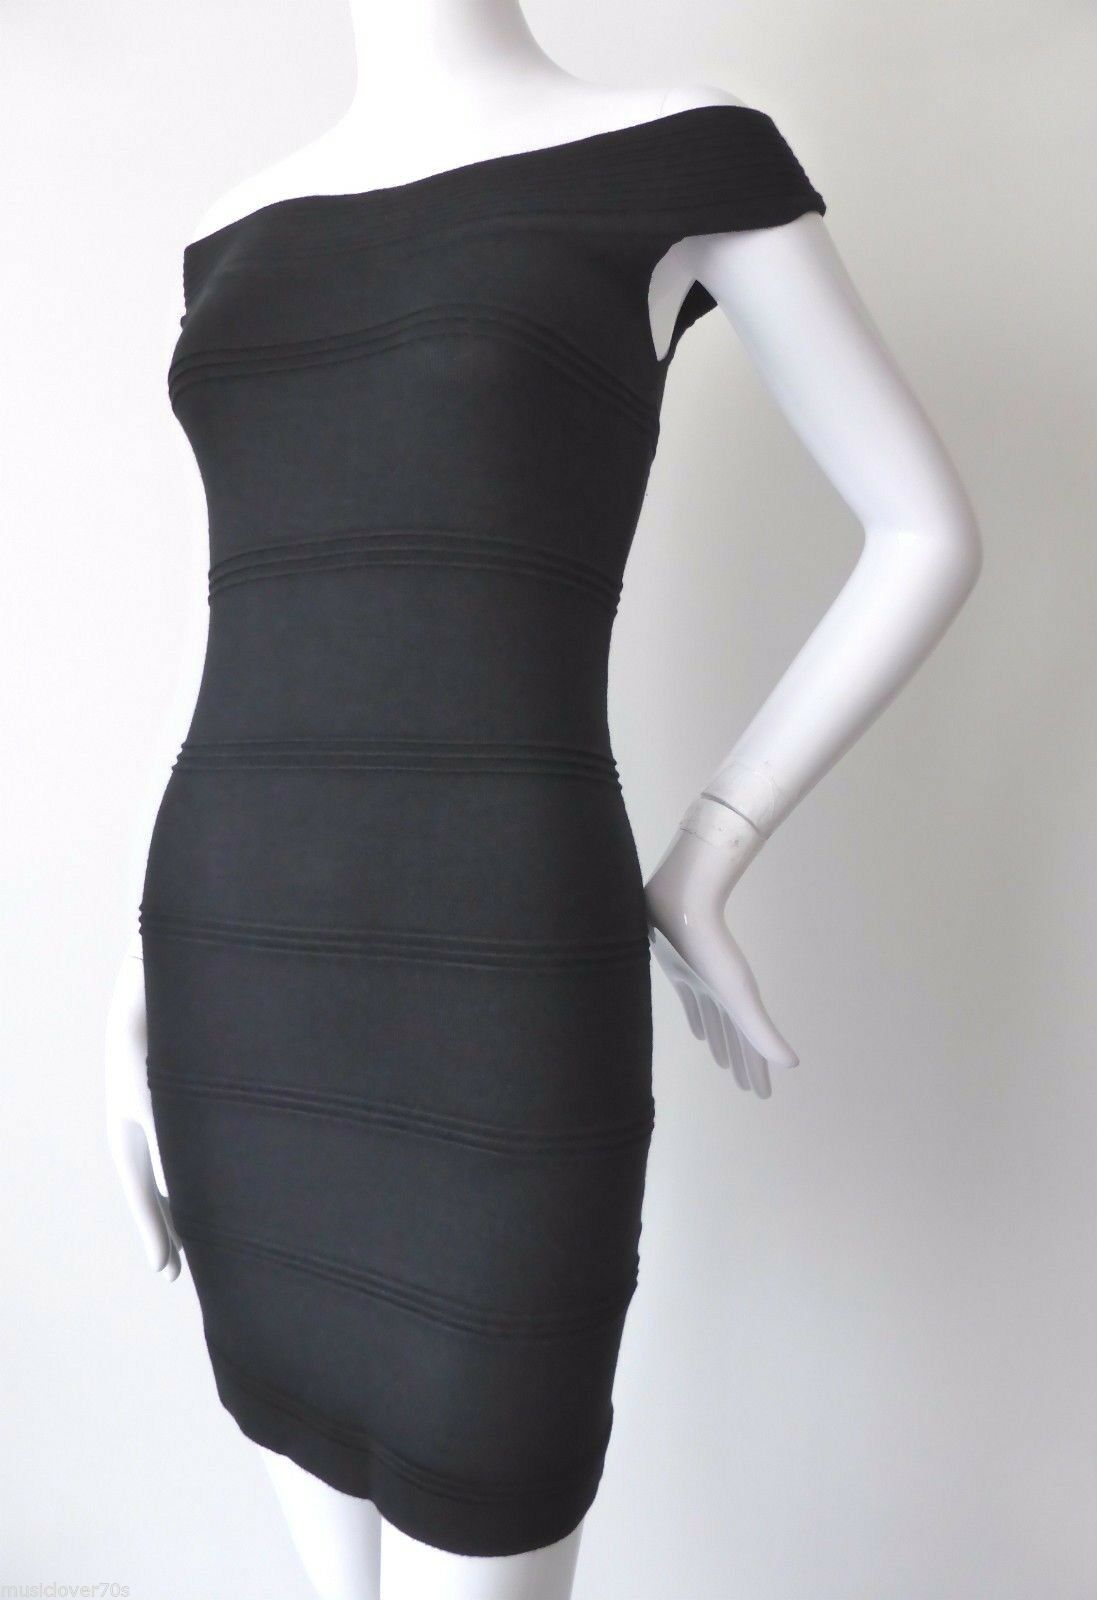 PILGRIM Woherren Dress NWT  Größe Small Off the Shoulder Bodycon Mini